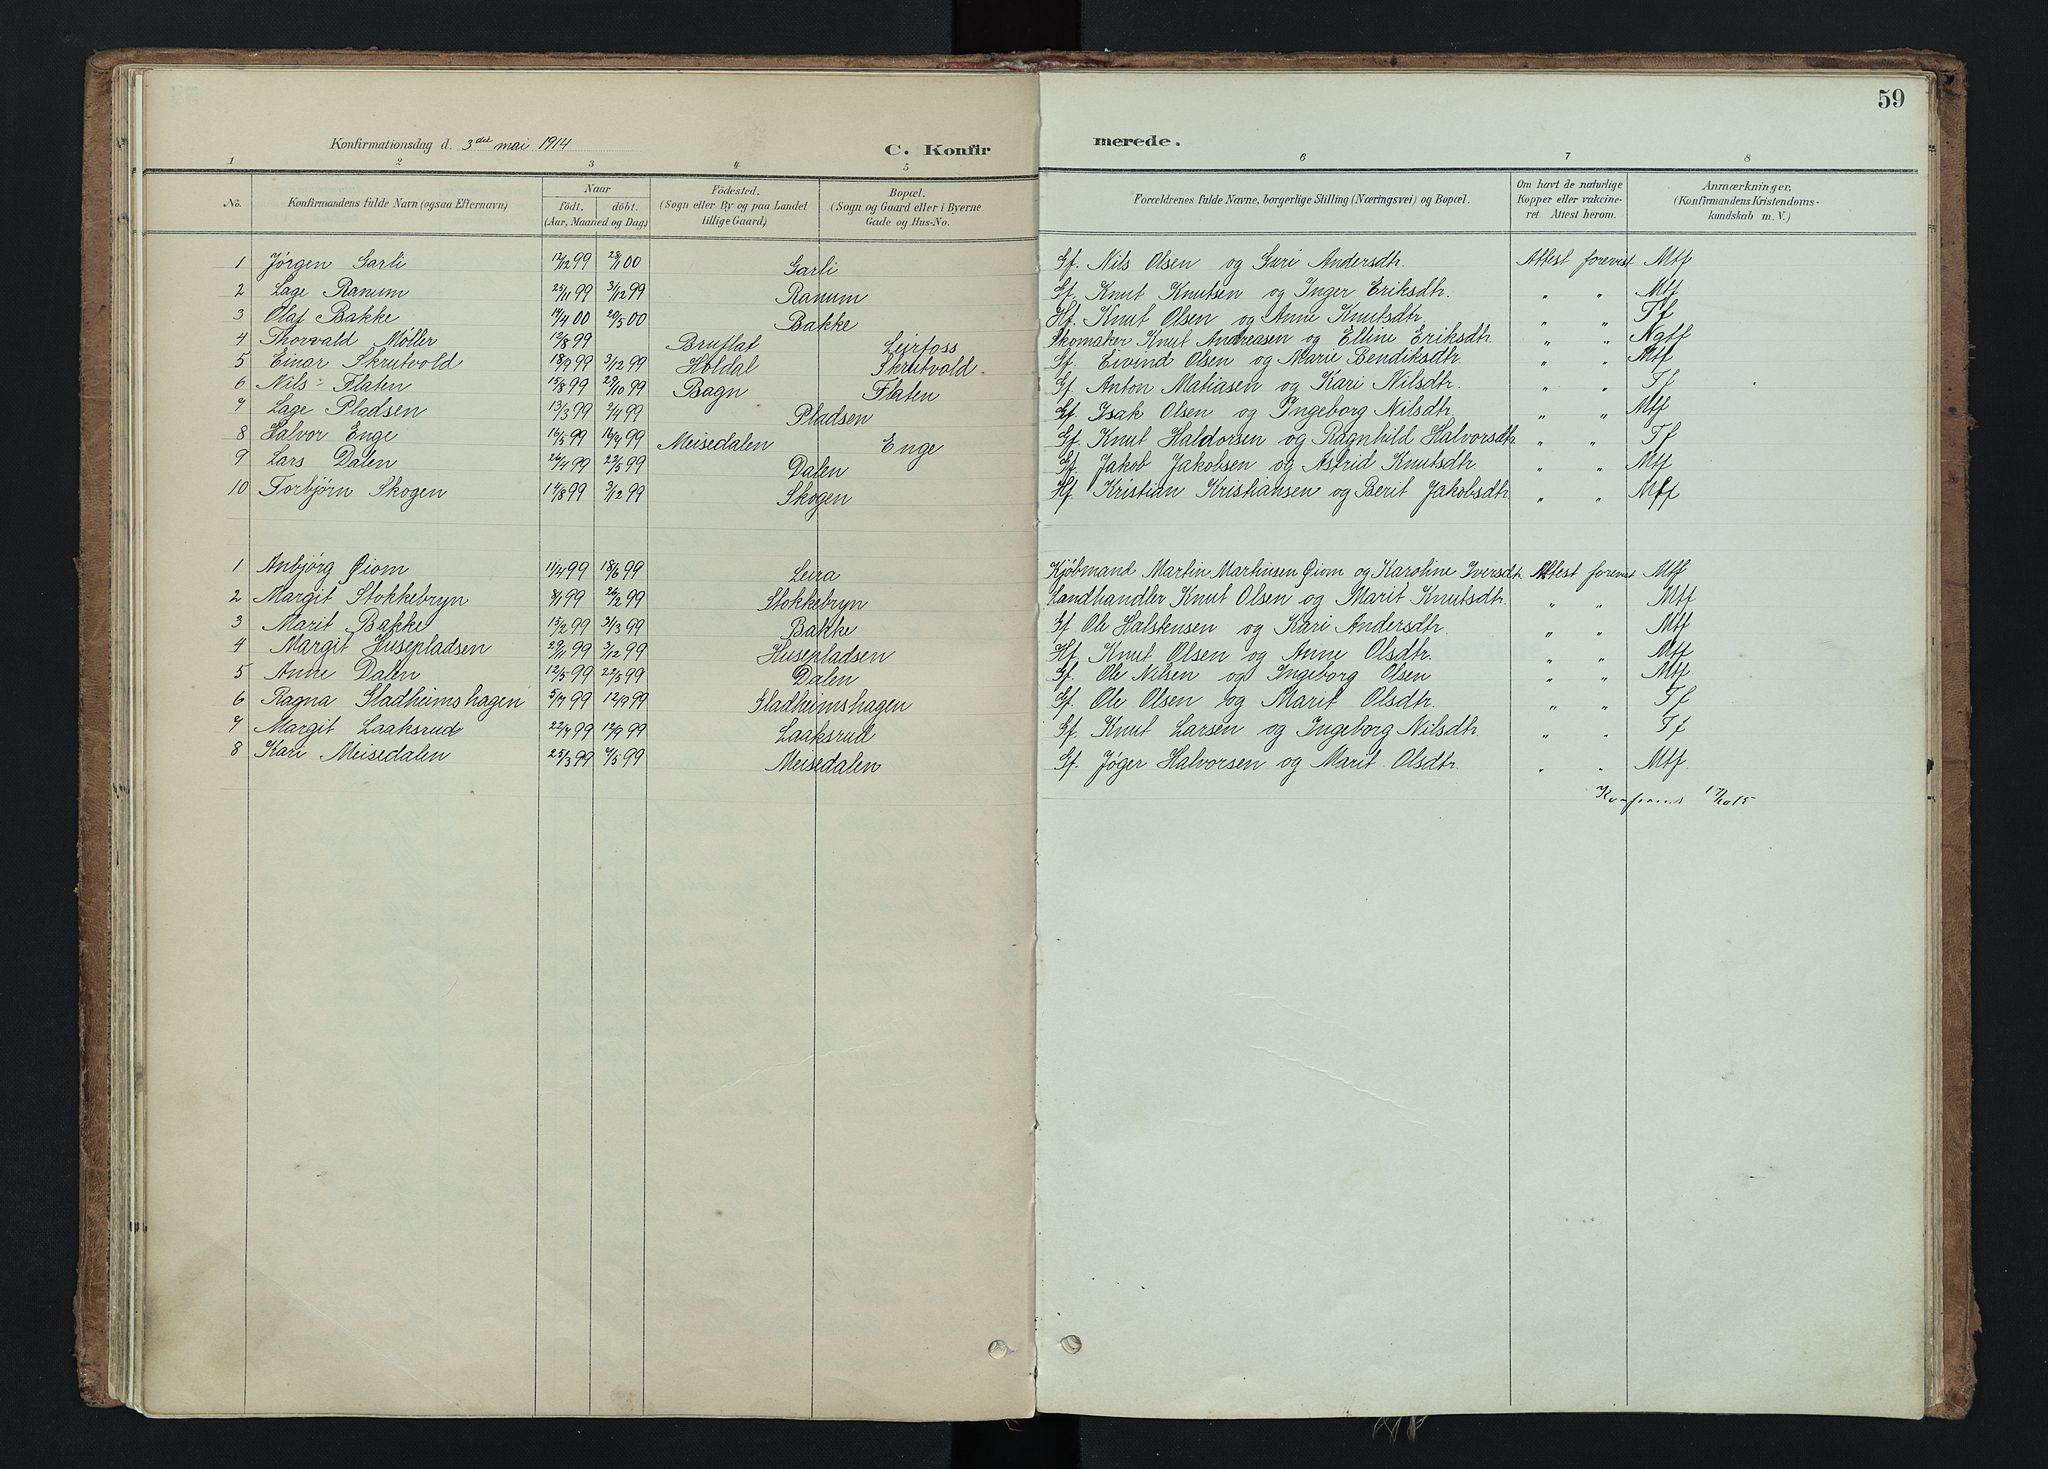 SAH, Nord-Aurdal prestekontor, Ministerialbok nr. 15, 1896-1914, s. 59